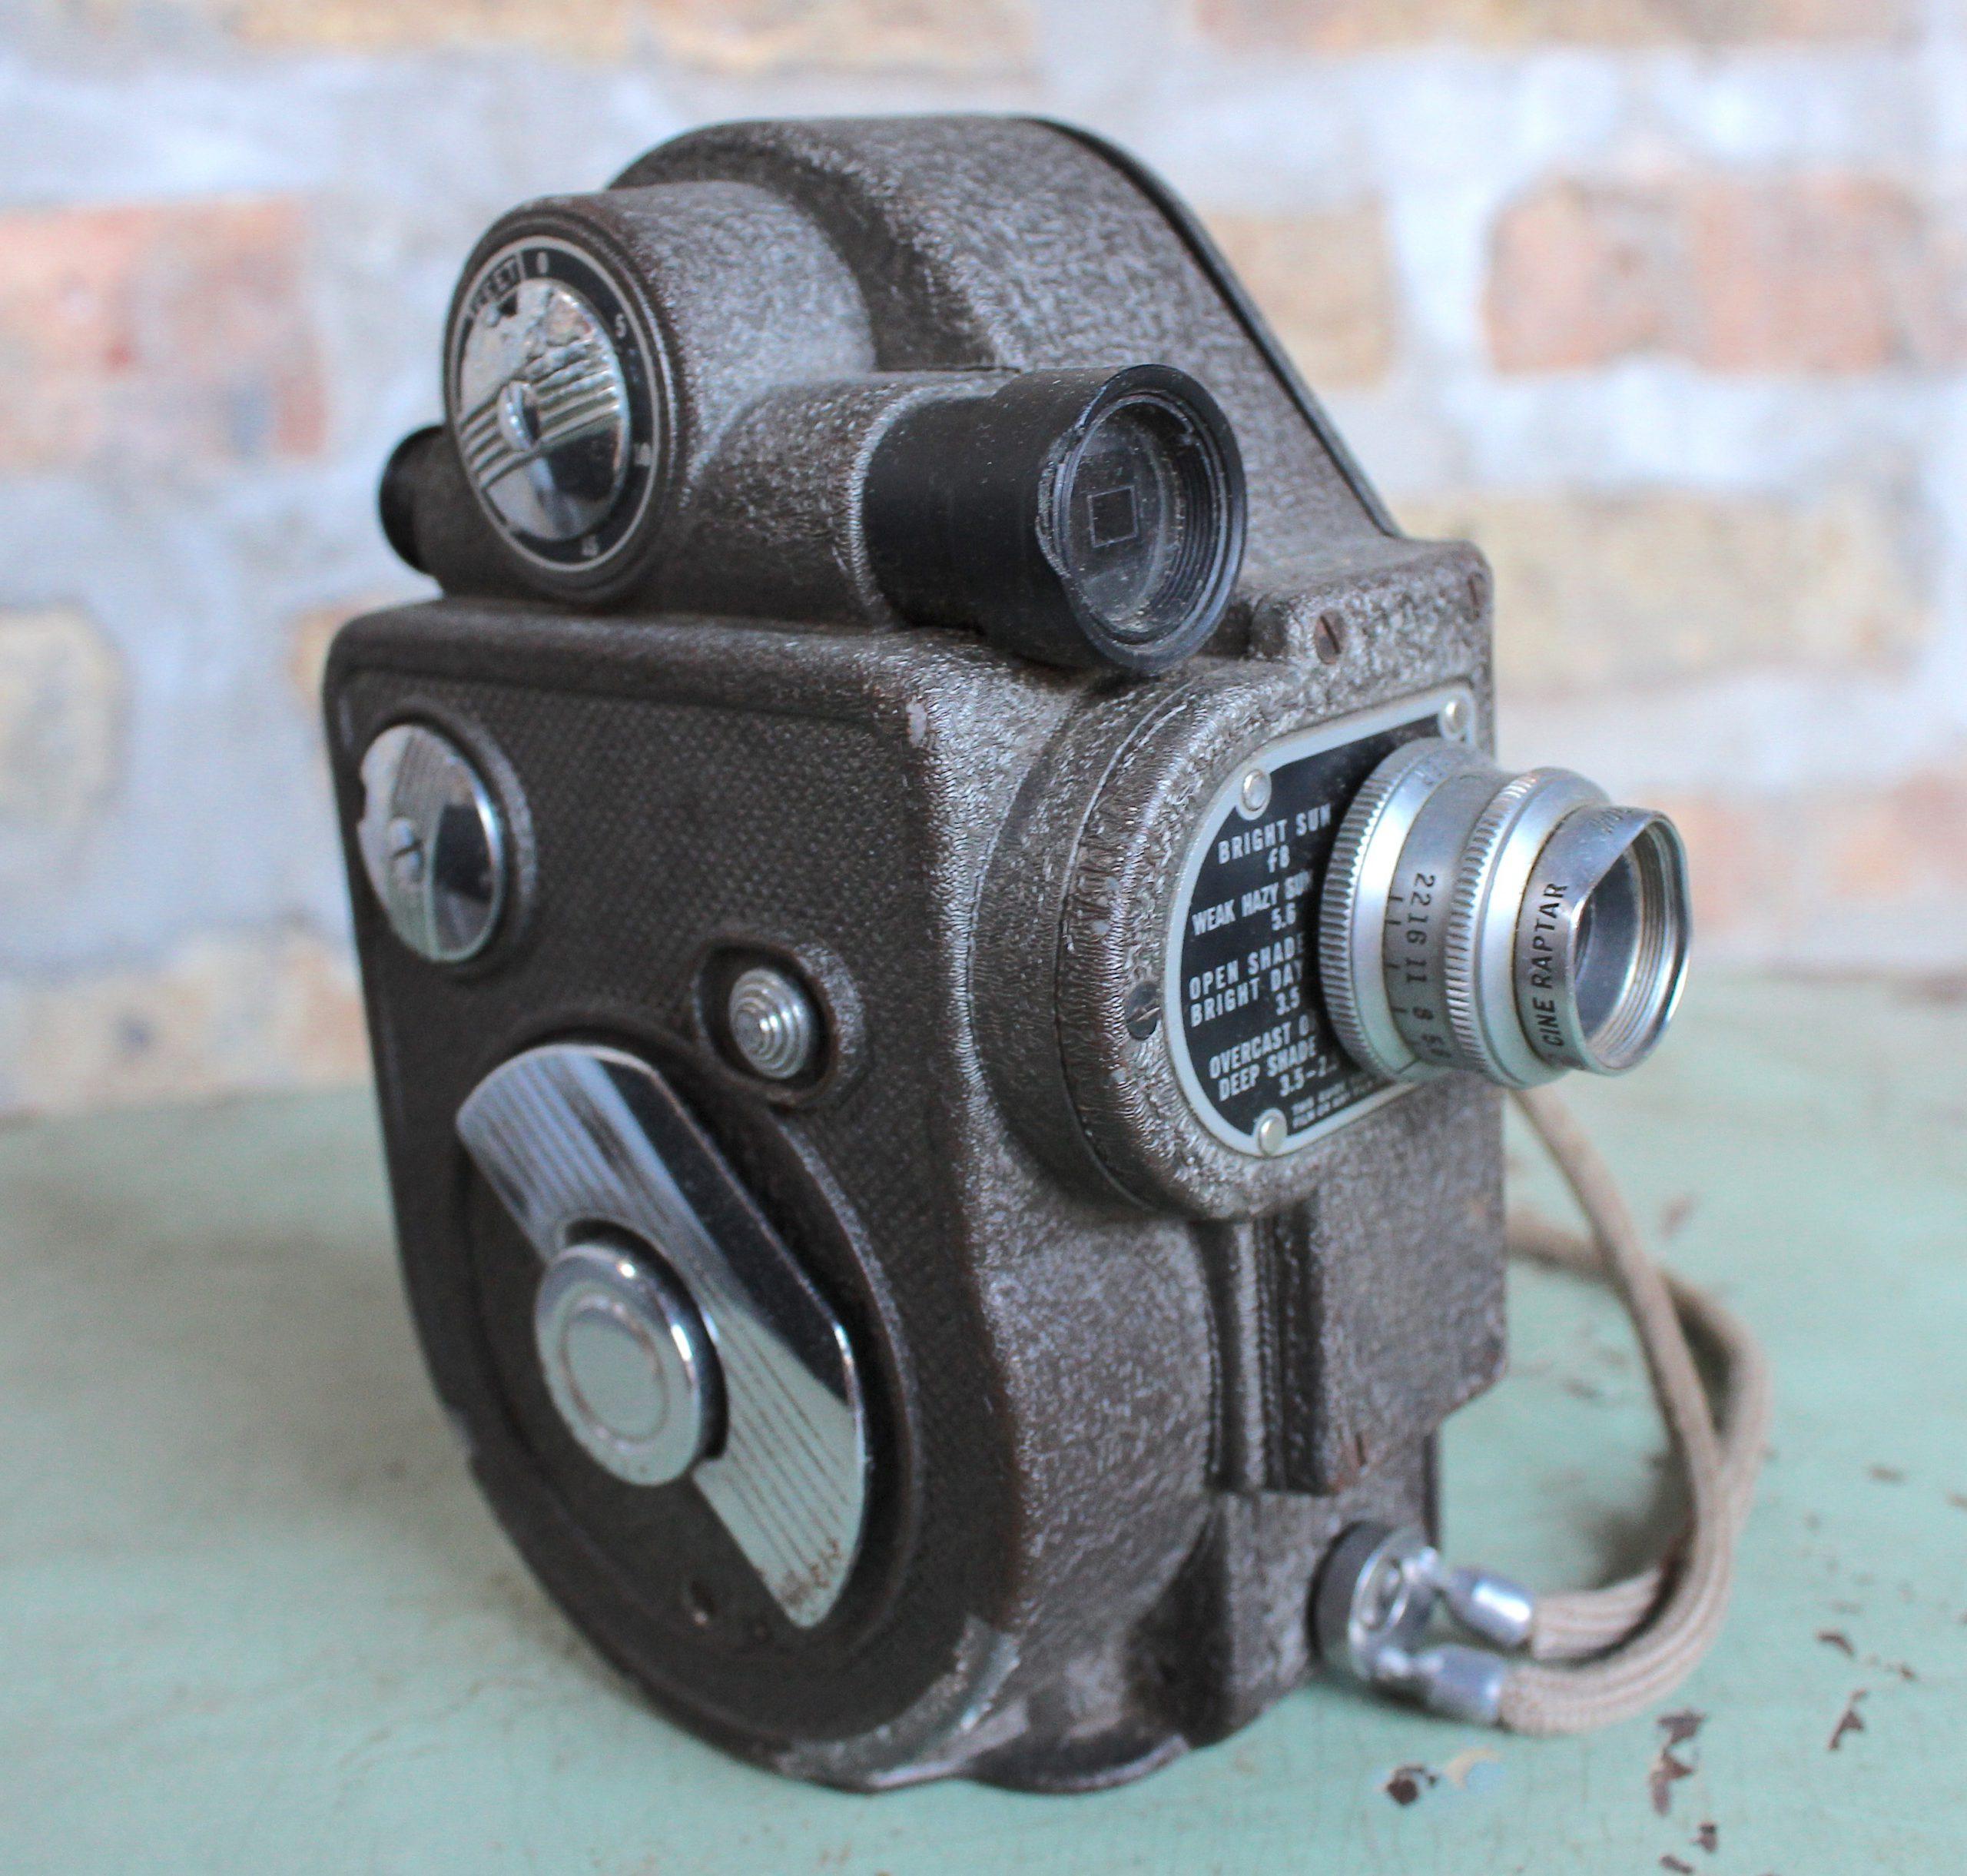 Revere Camera Company, est. 1939